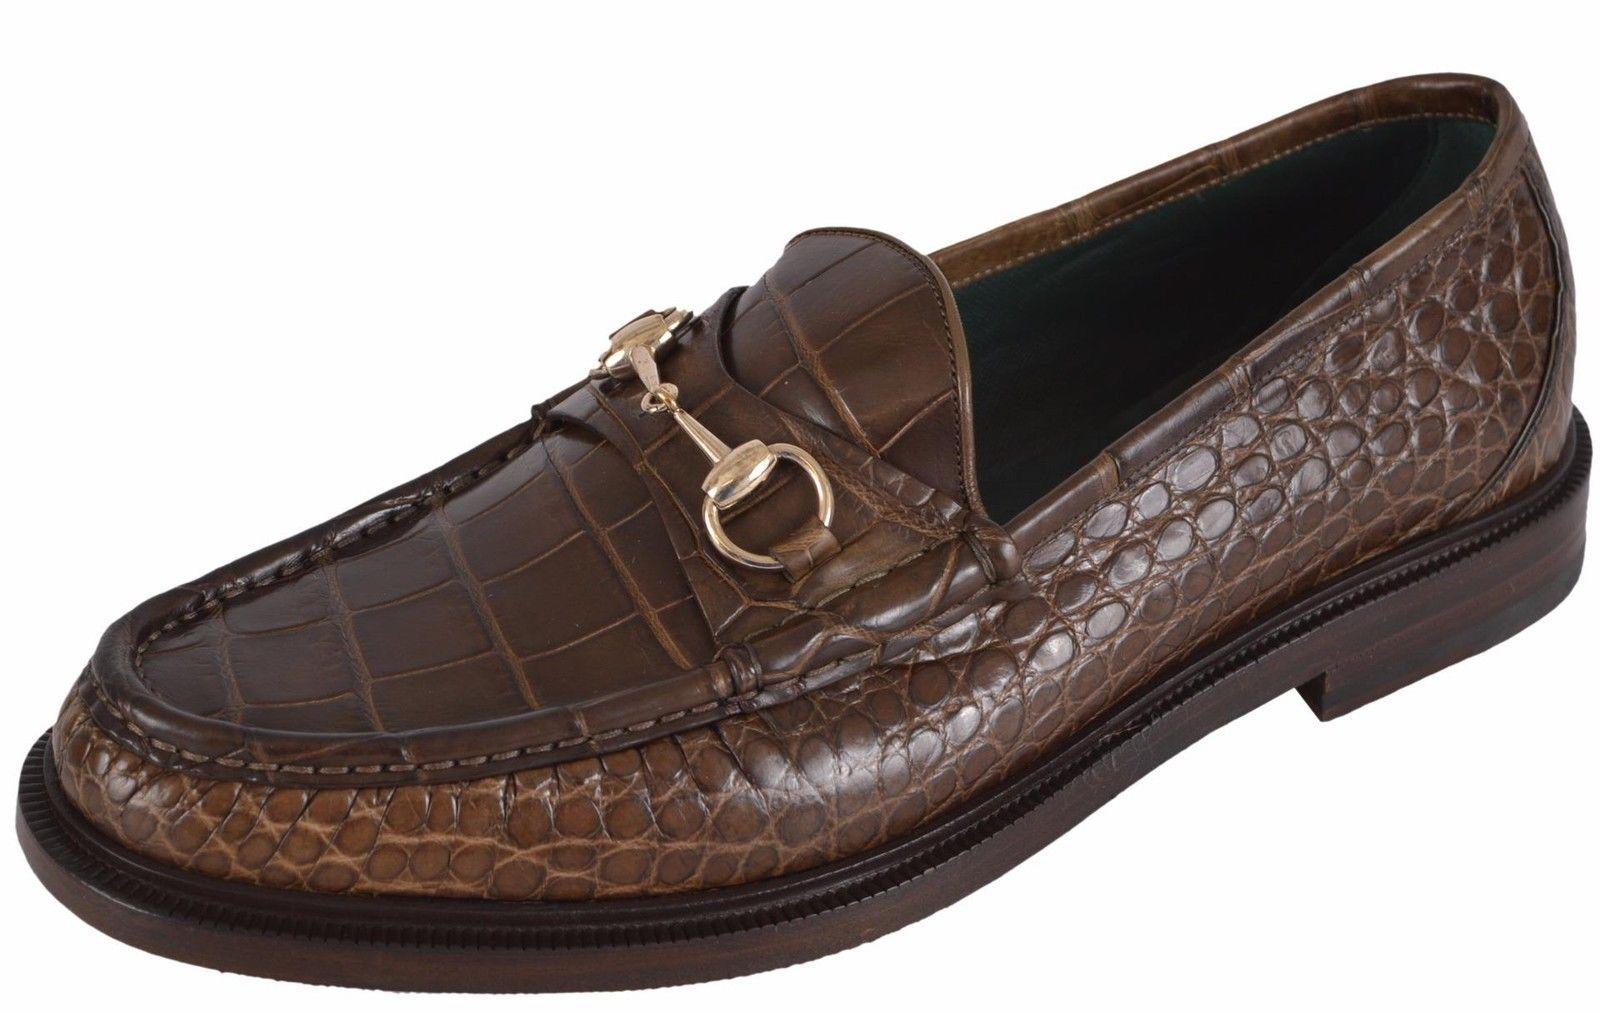 3aca9742a78 Gucci alligator horsebit loafer